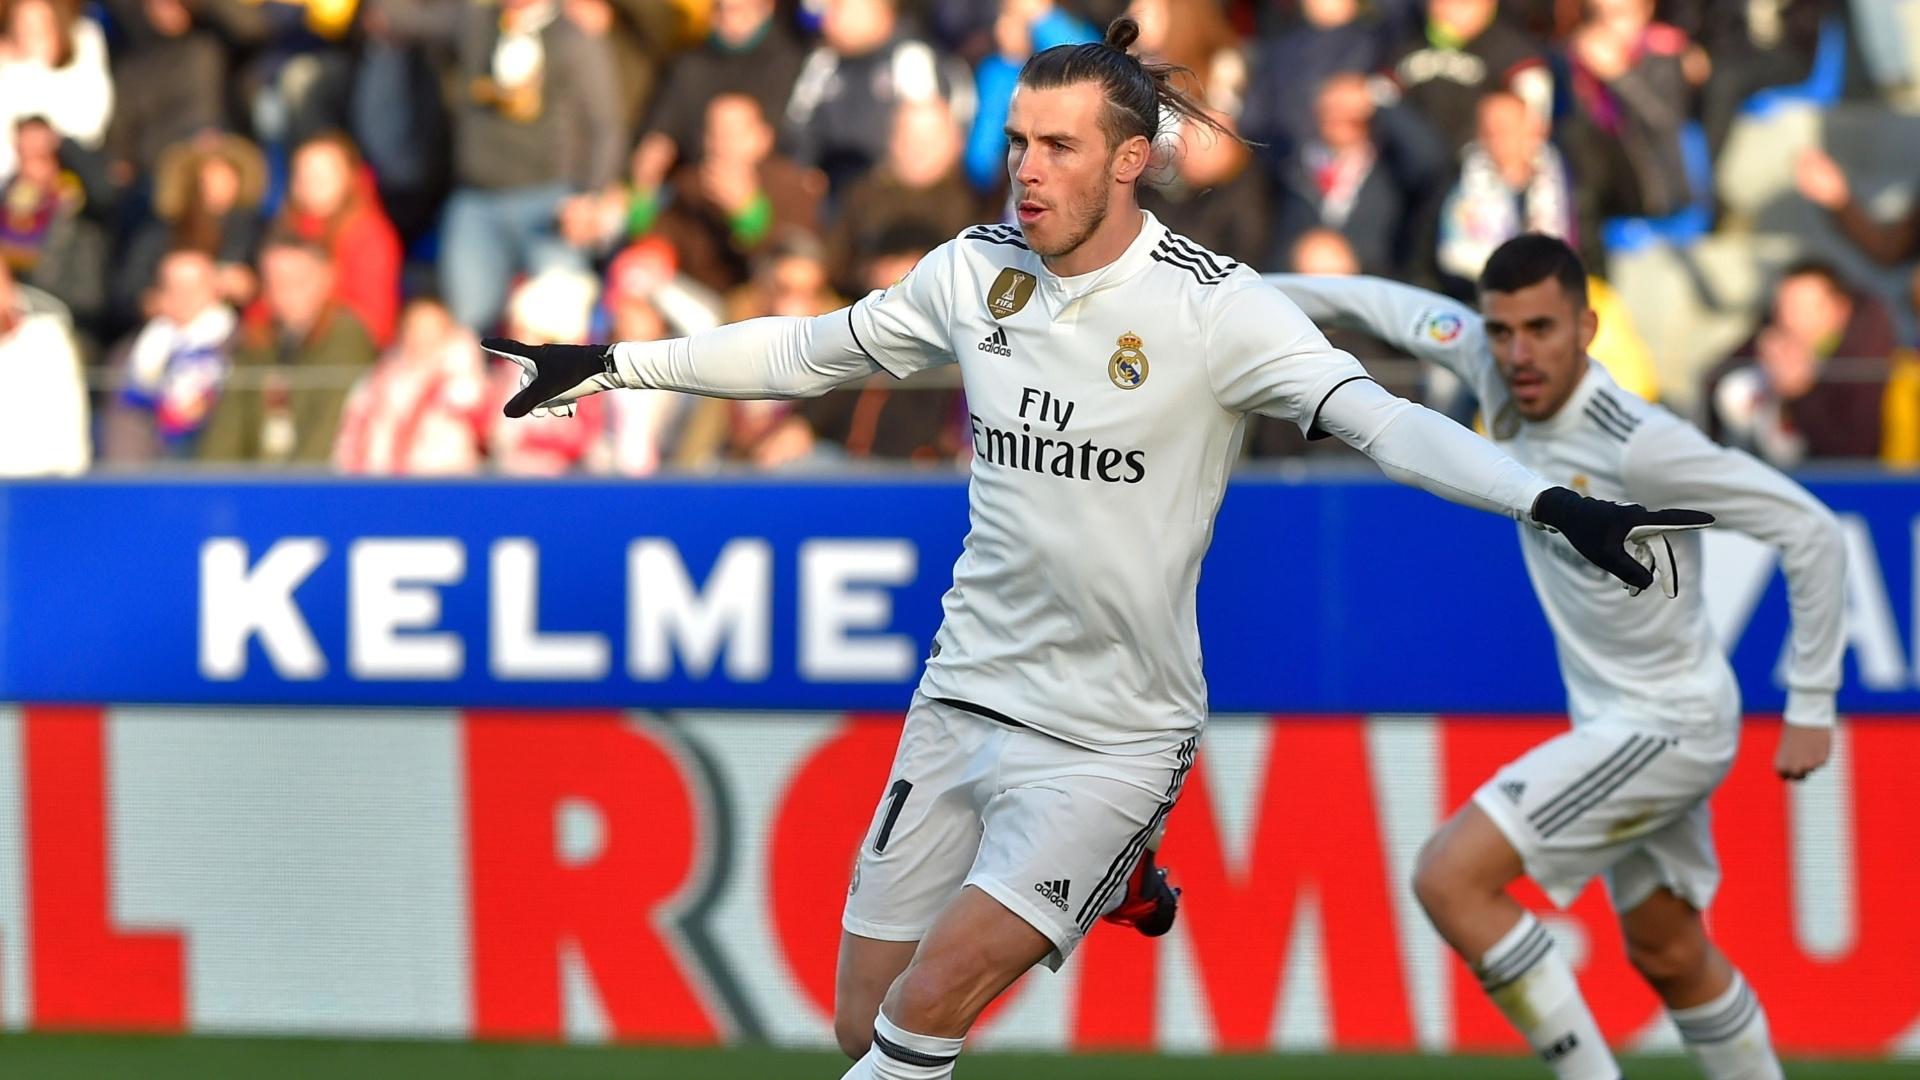 Gareth Bale comemora gol marcado para o Real Madrid contra o Huesca